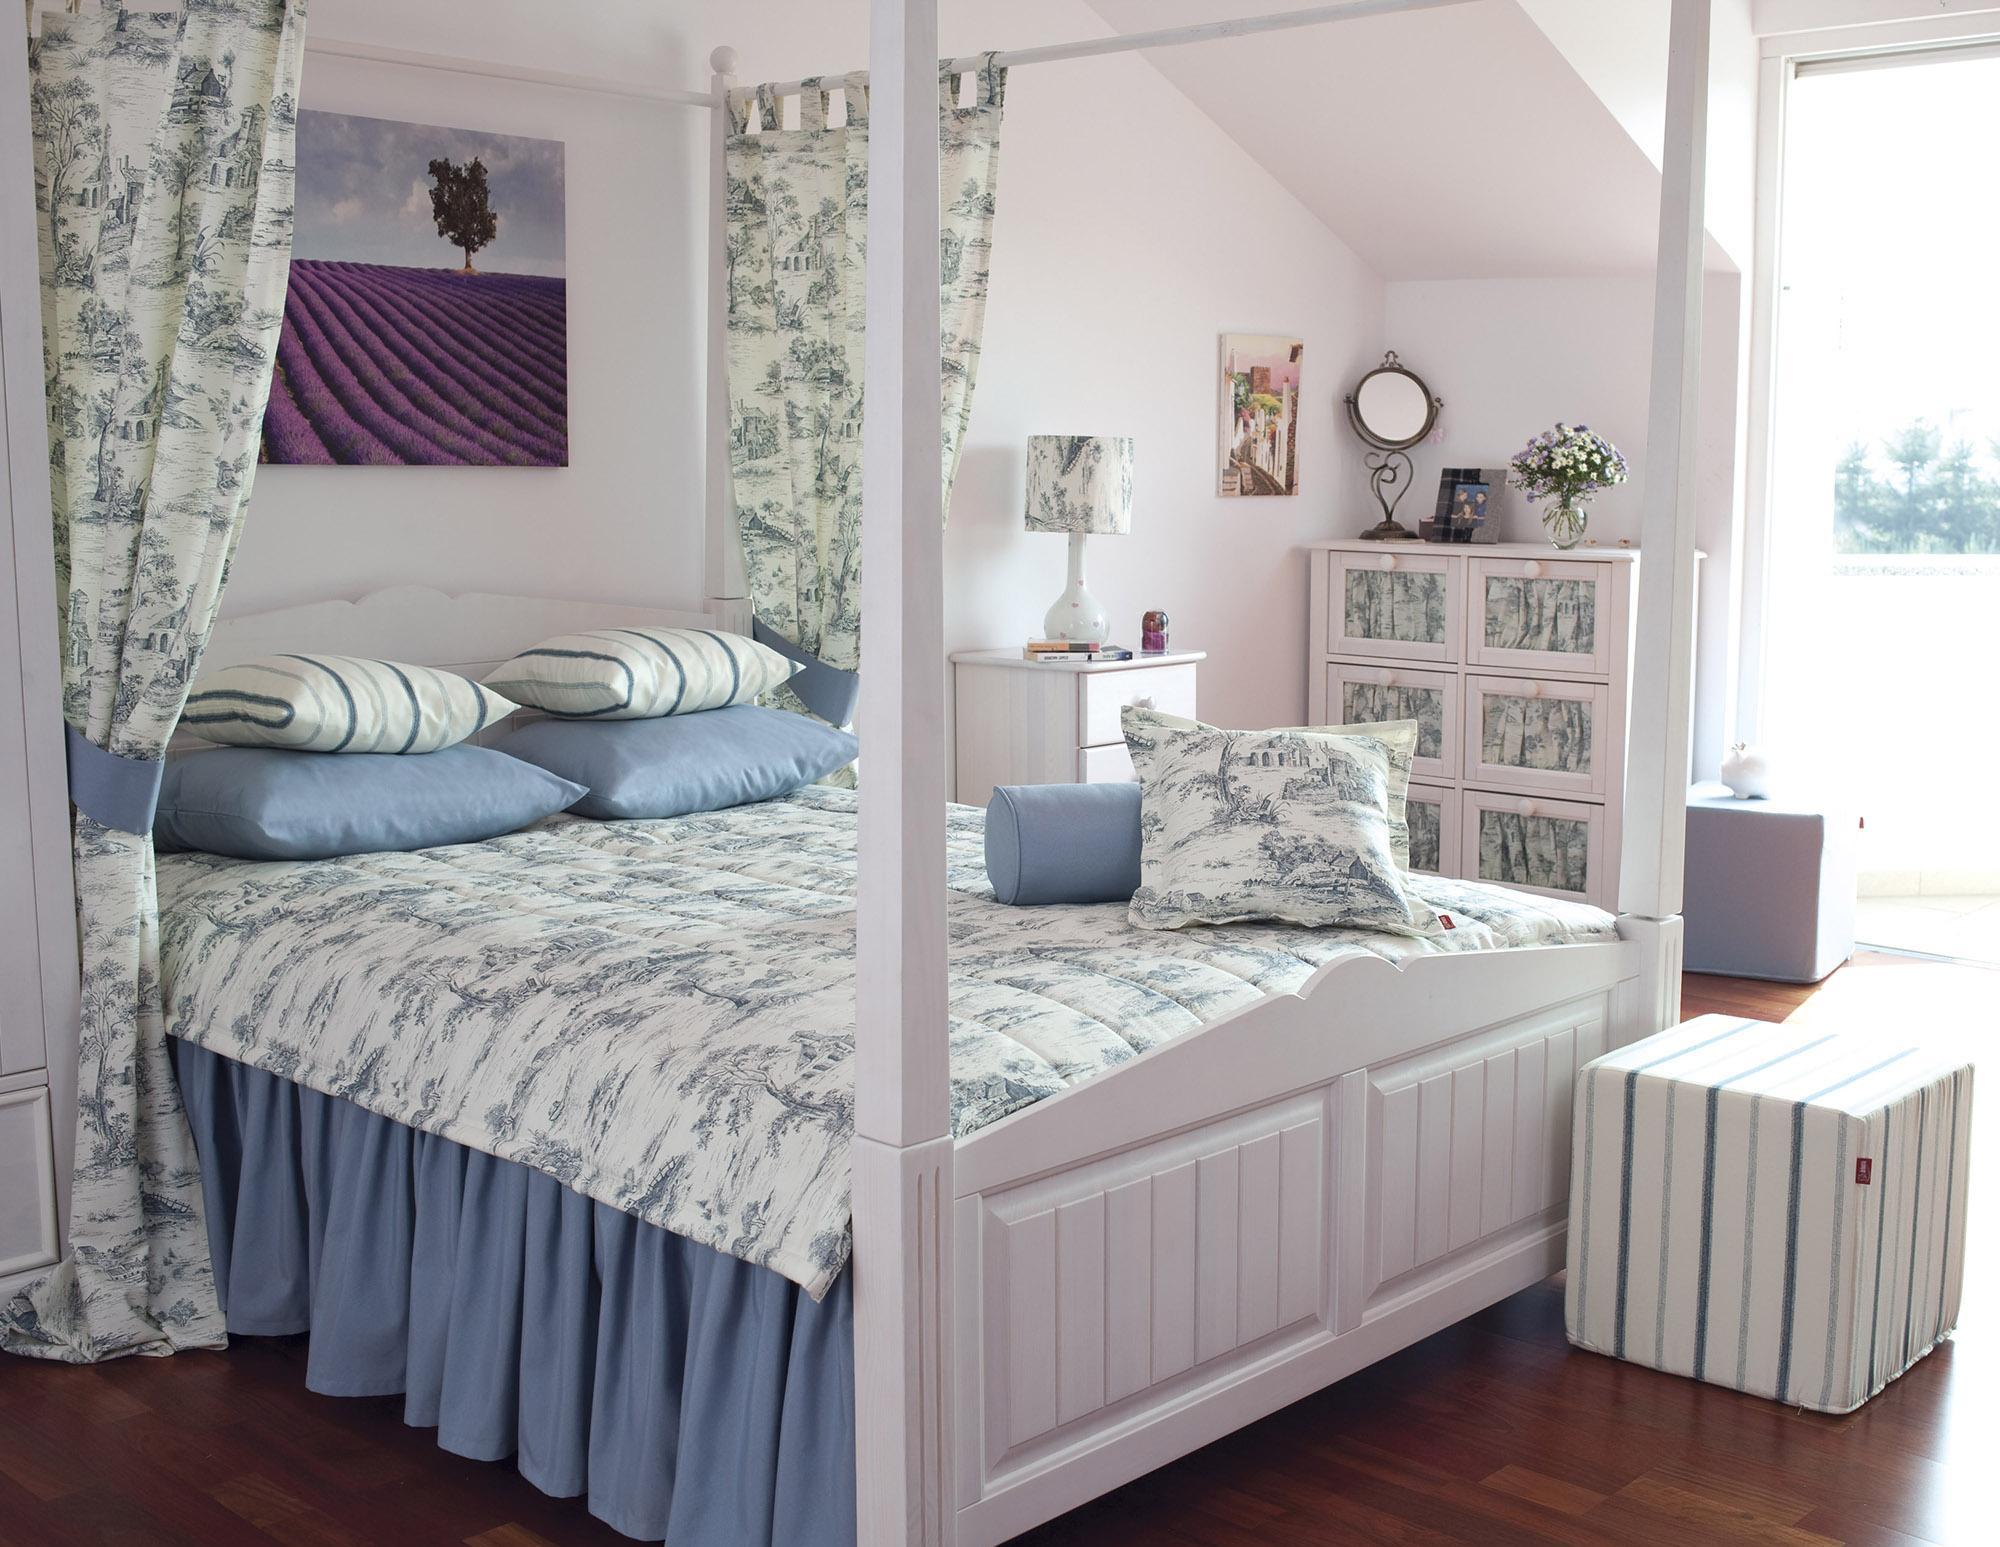 Плотный балдахин с рисунком на раме кровати